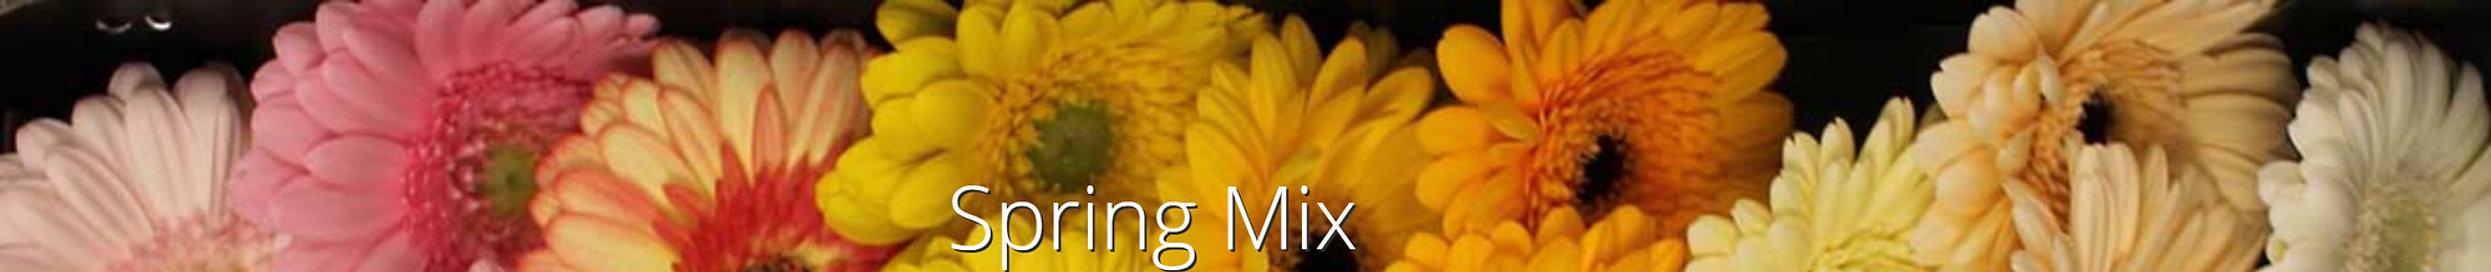 spring mix.jpg